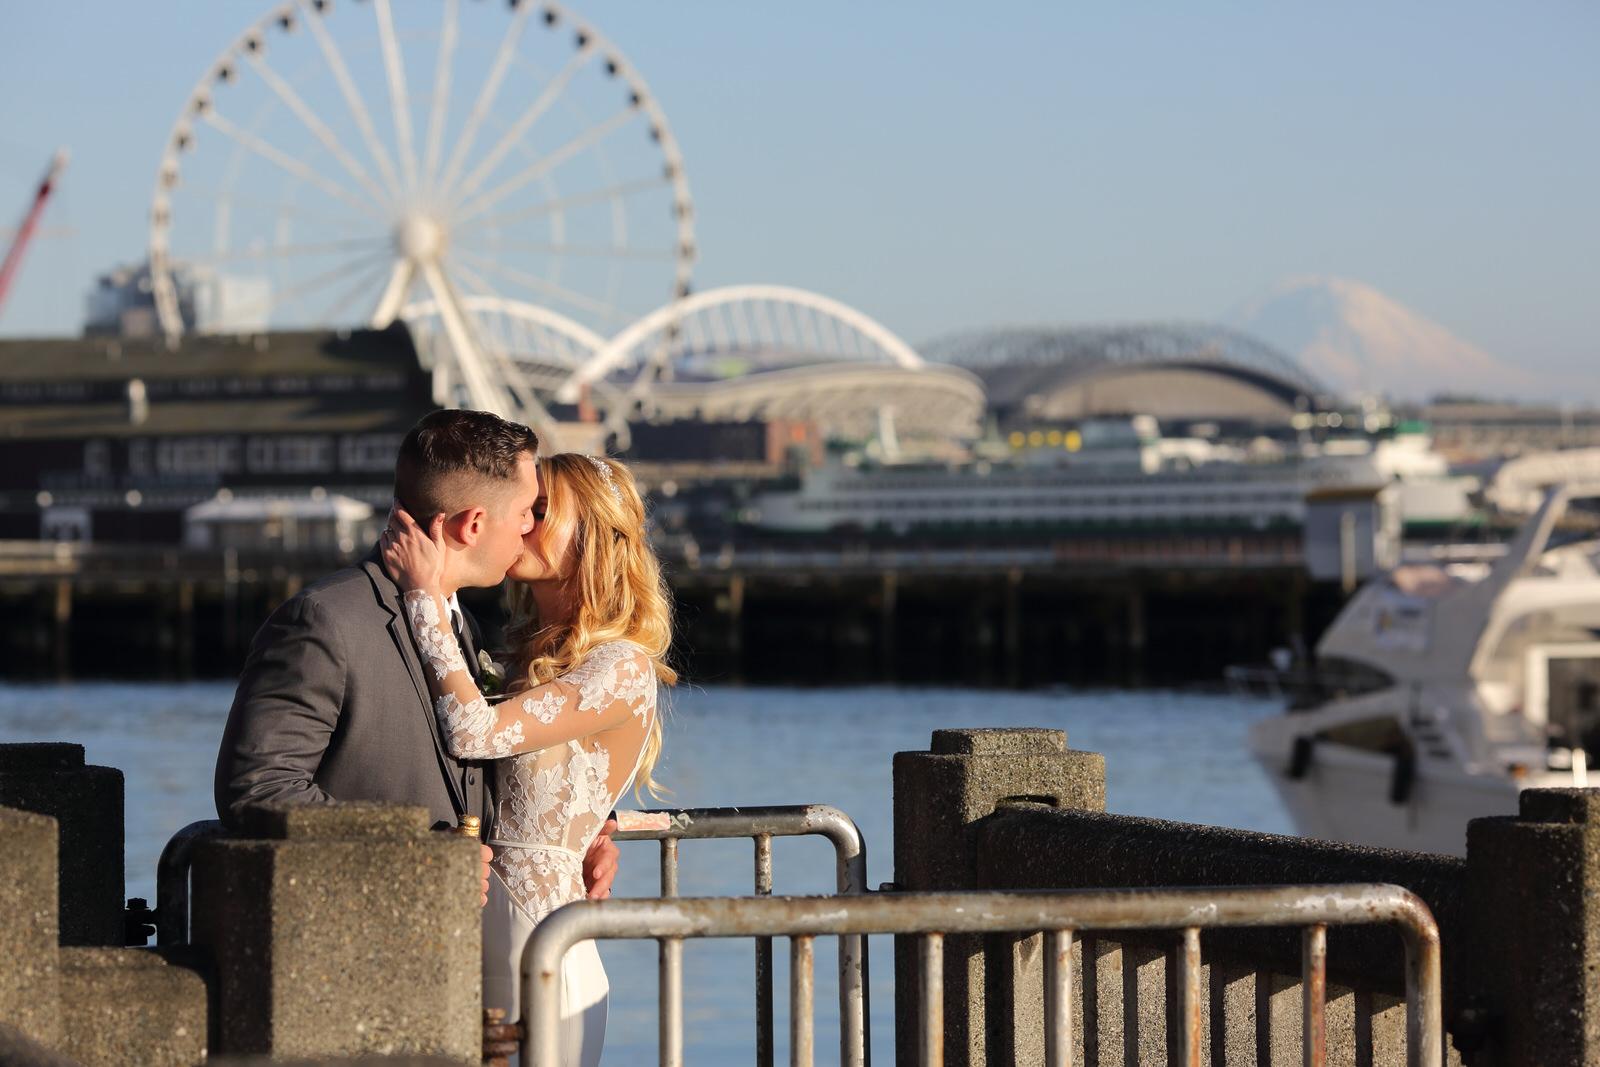 Wedding Photo downtown Seattle Ferris Wheel